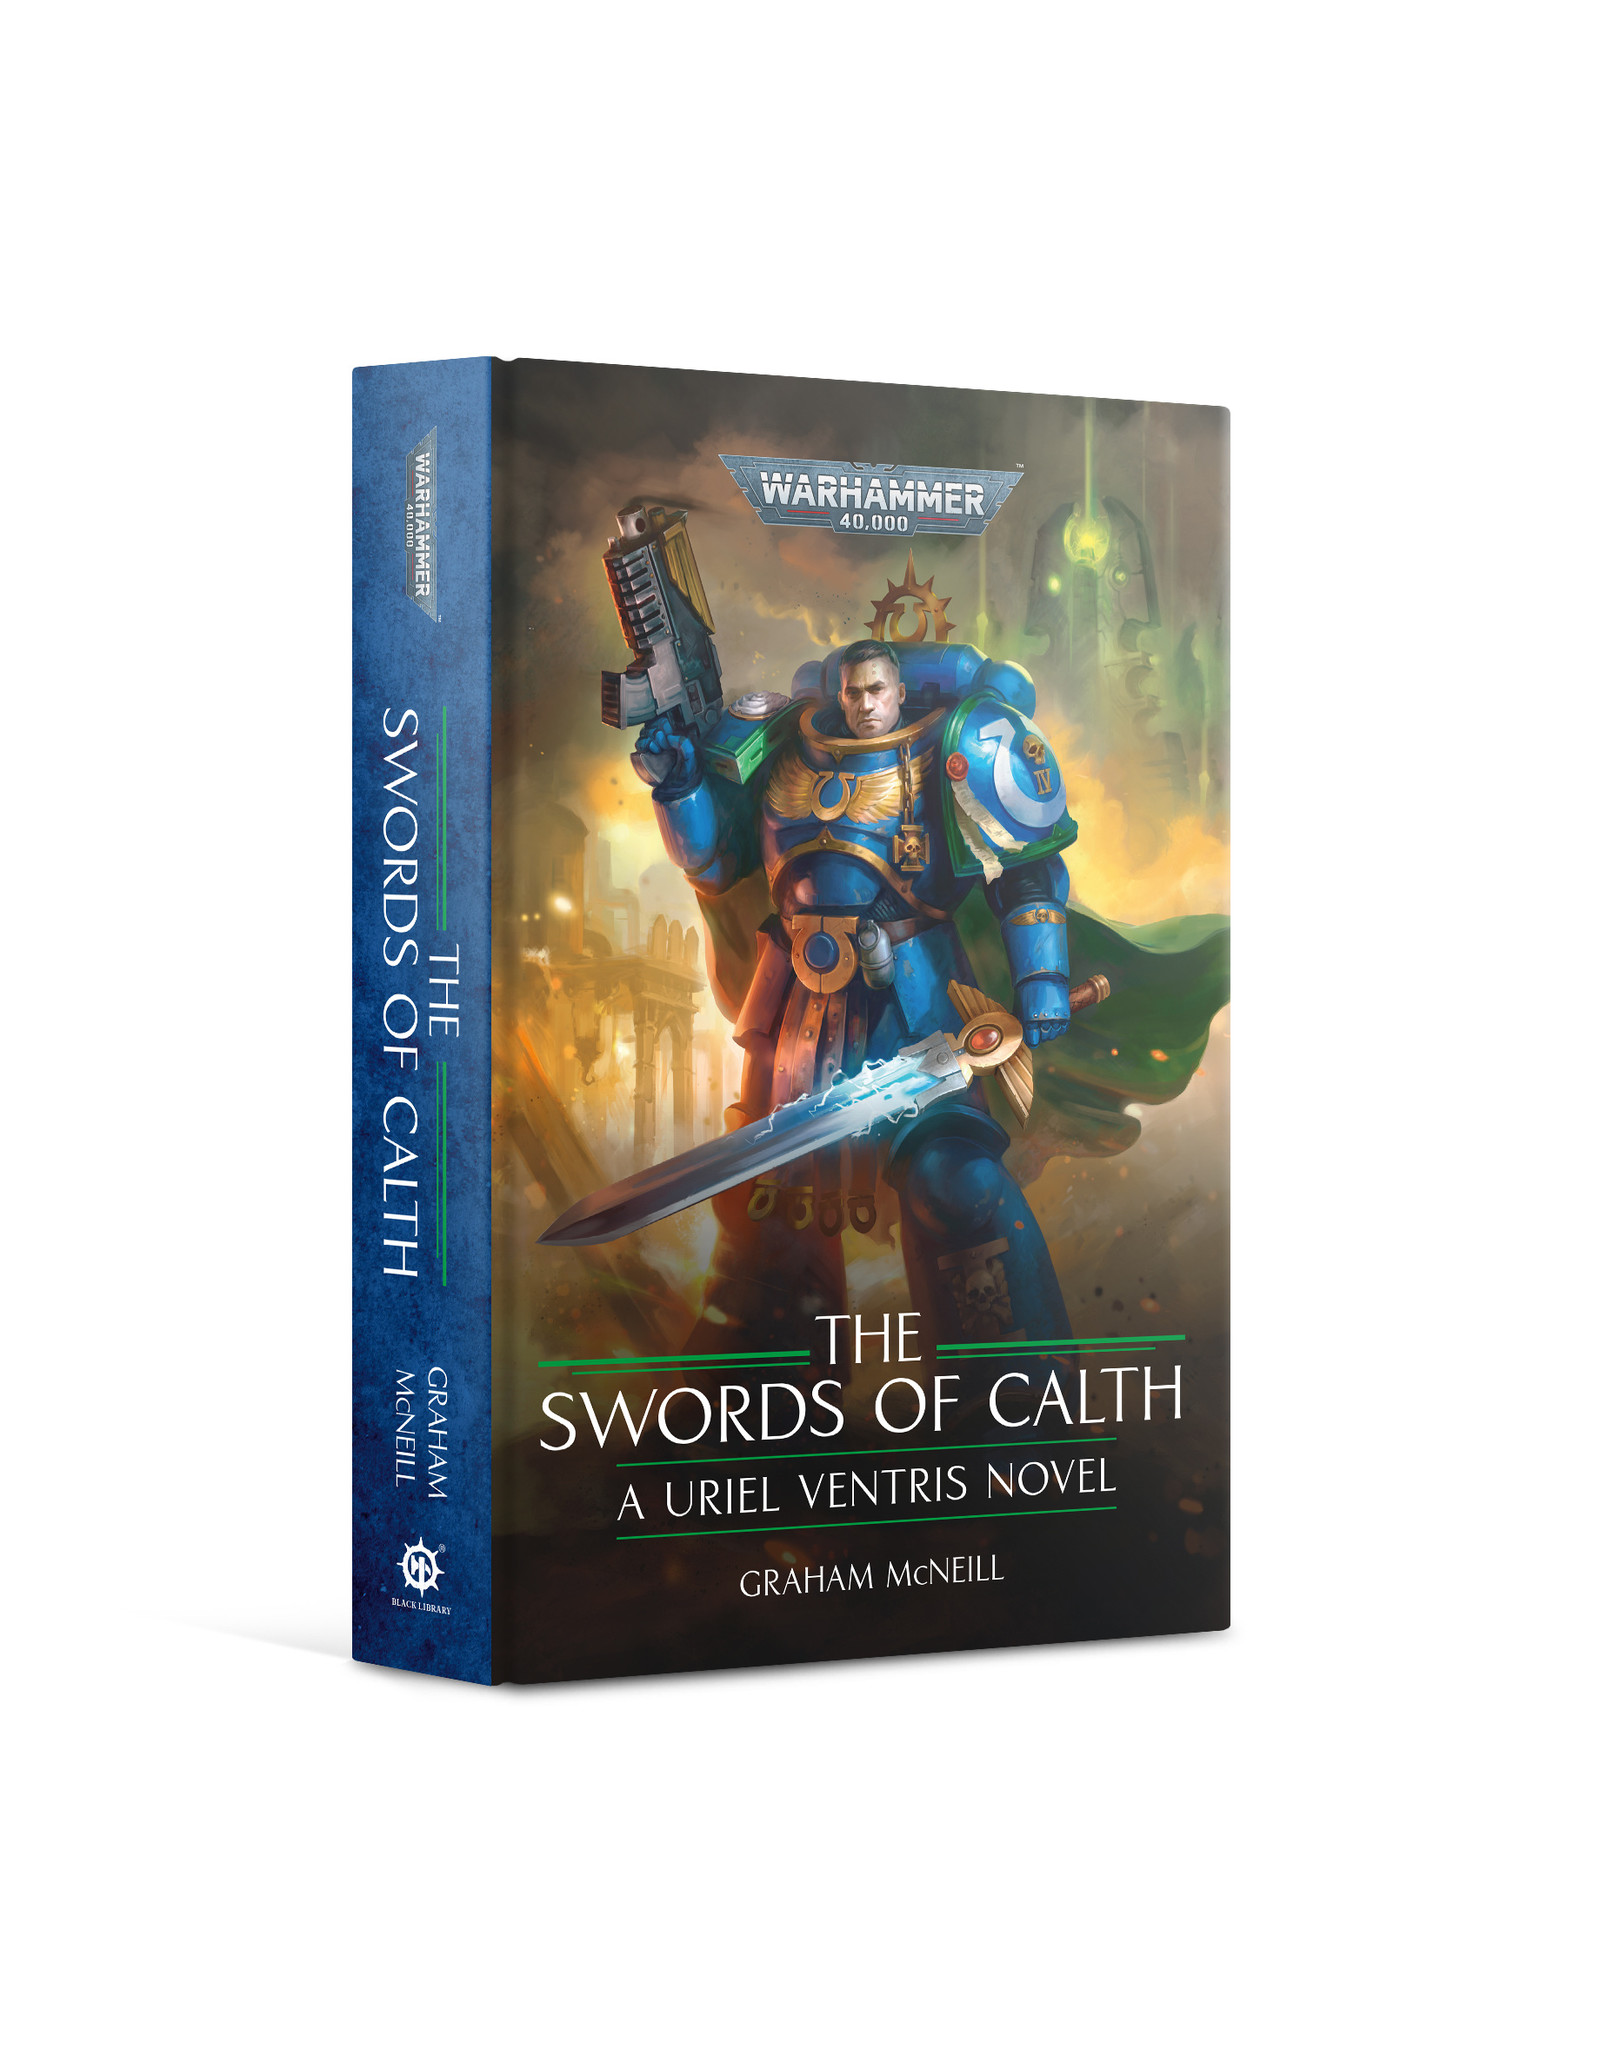 Warhammer 40K Uriel Ventris:  The Swords of Calth